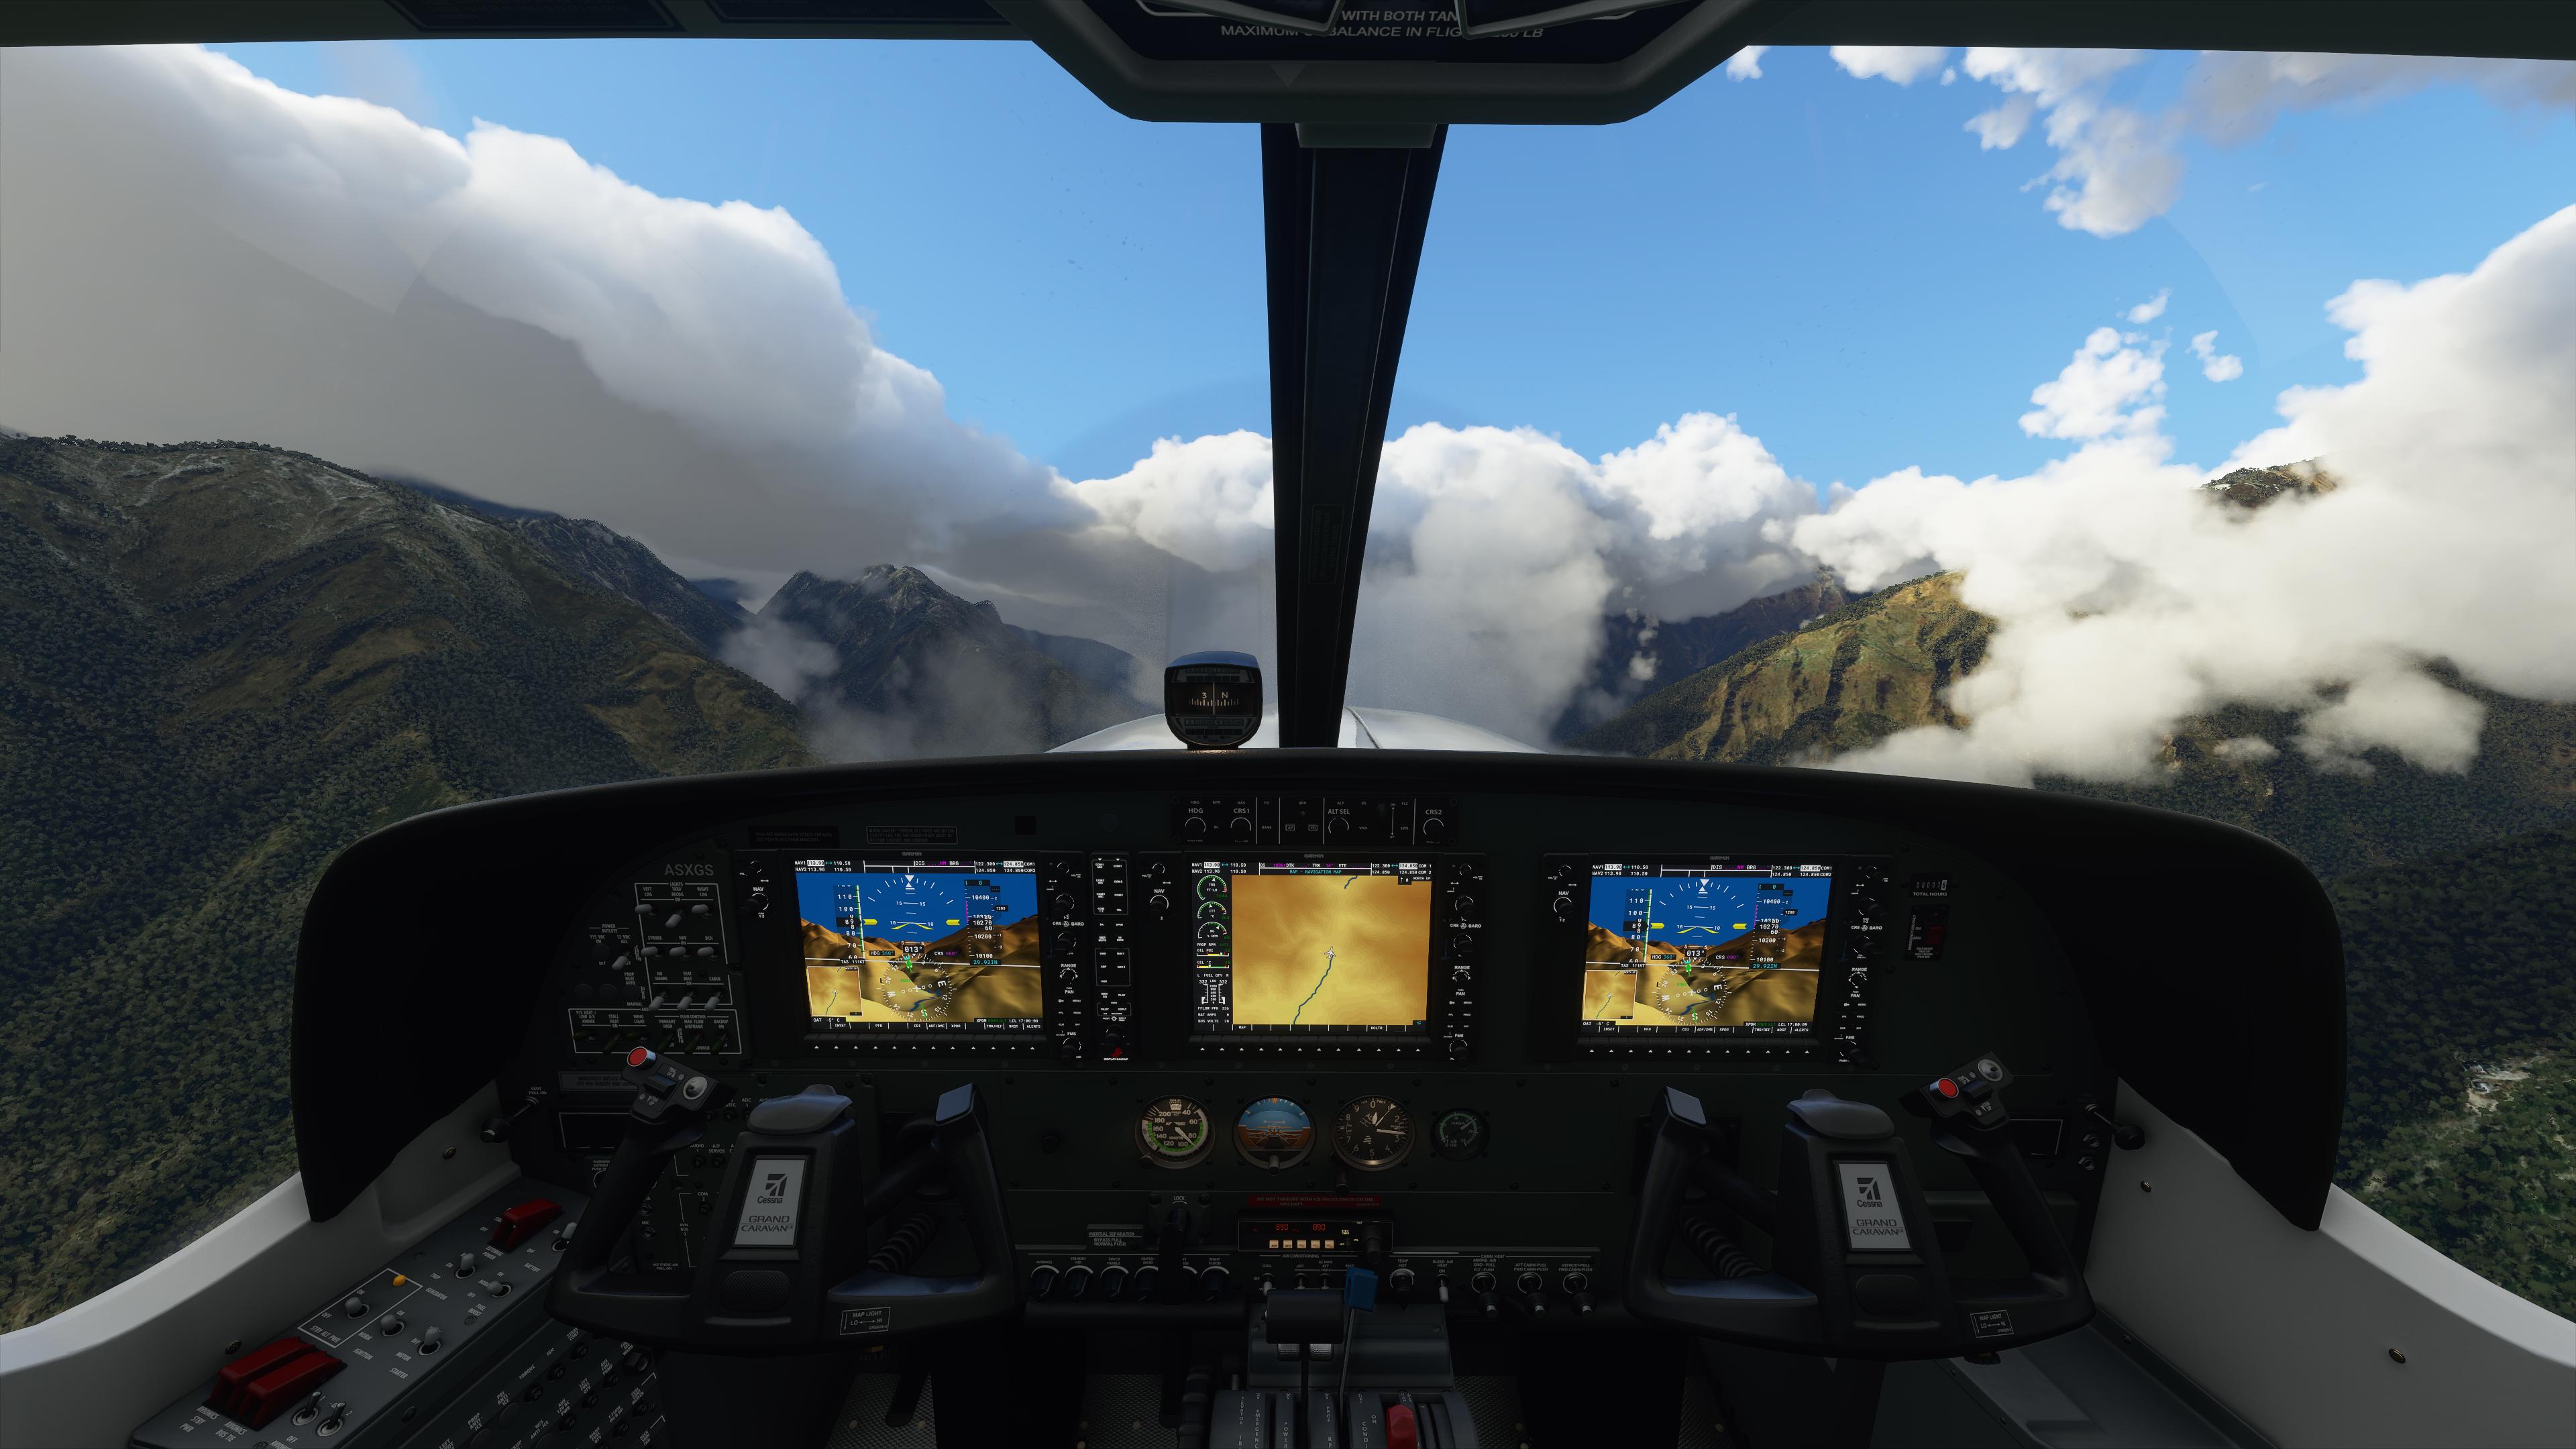 Pemandangan dari dalam pesawat pada game Flight Simulator 2020